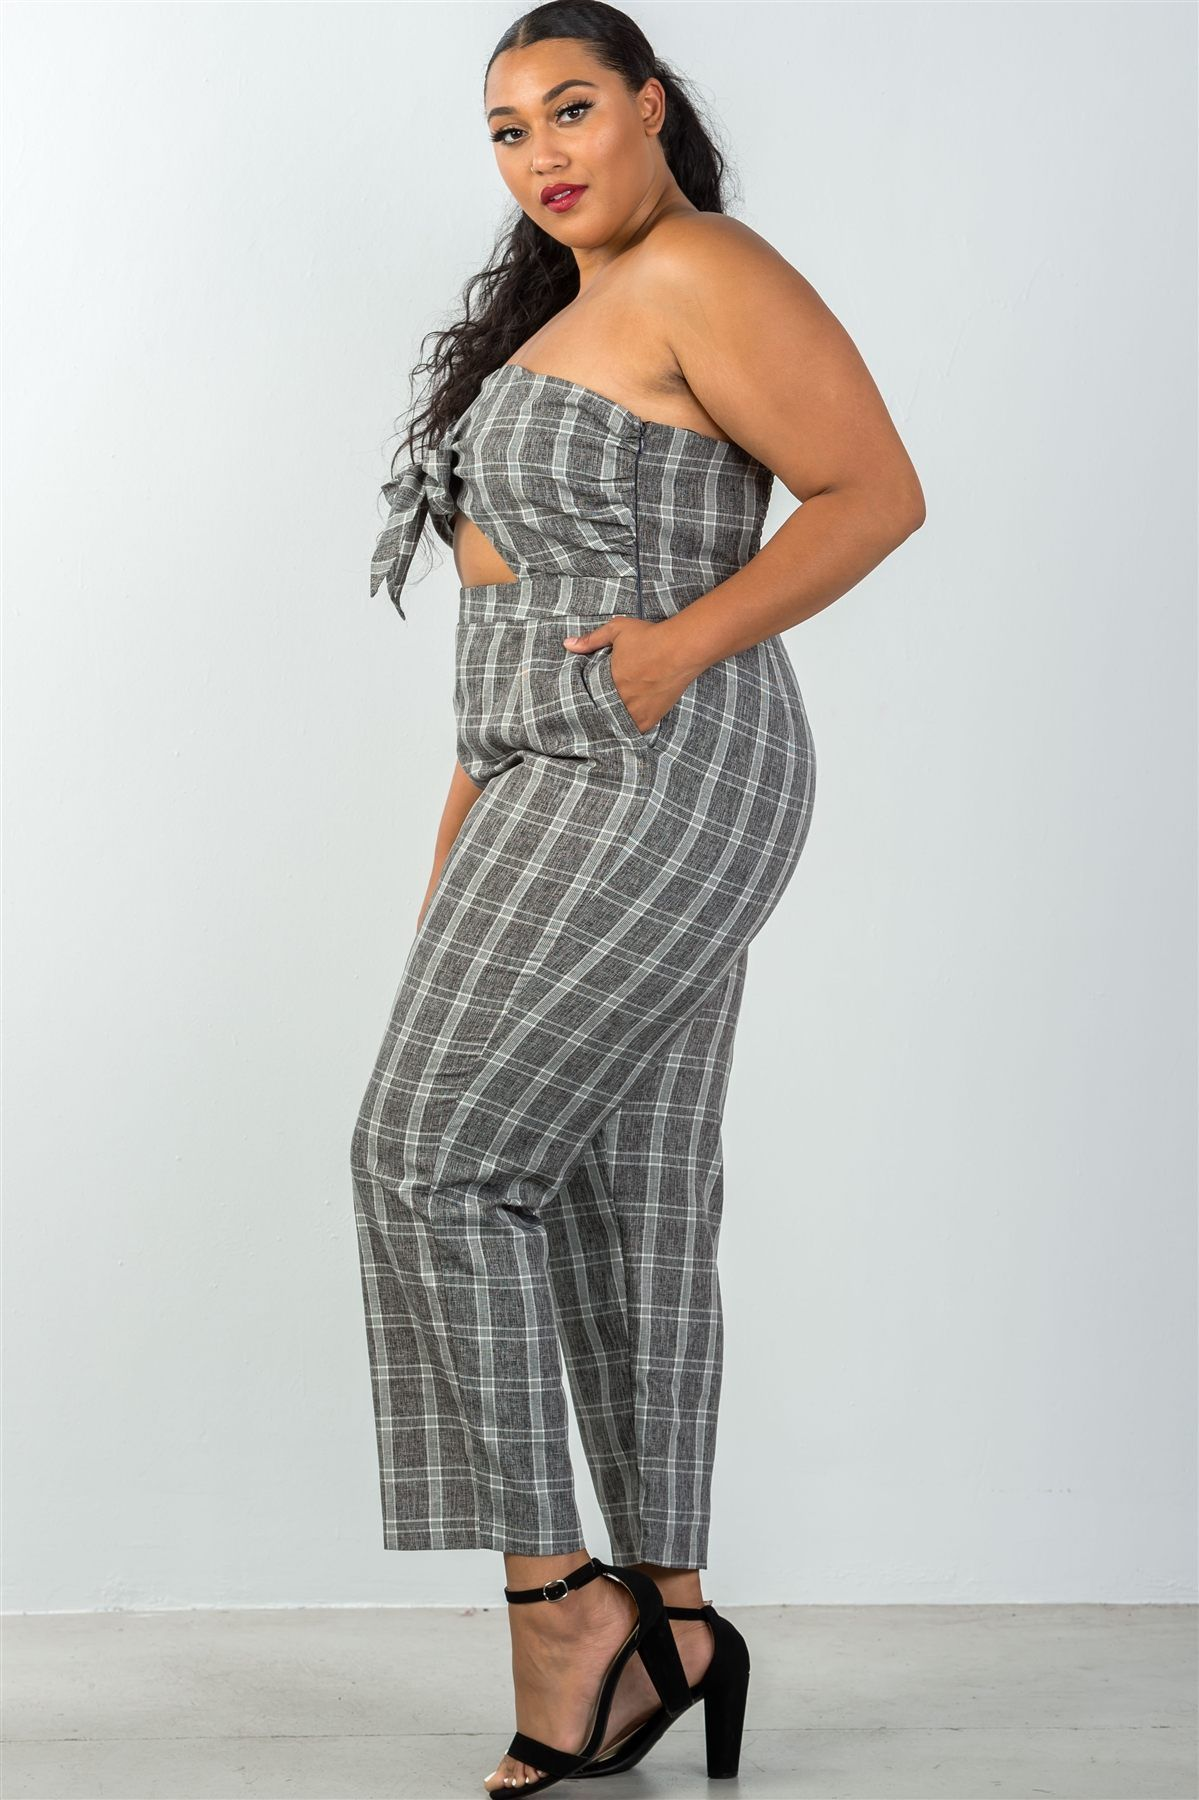 9bb518f9525 GREY SCOTTISH JUMPSUIT  Outfit  Summer  SummerJumpsuit  fashion  UAE   Middleeast